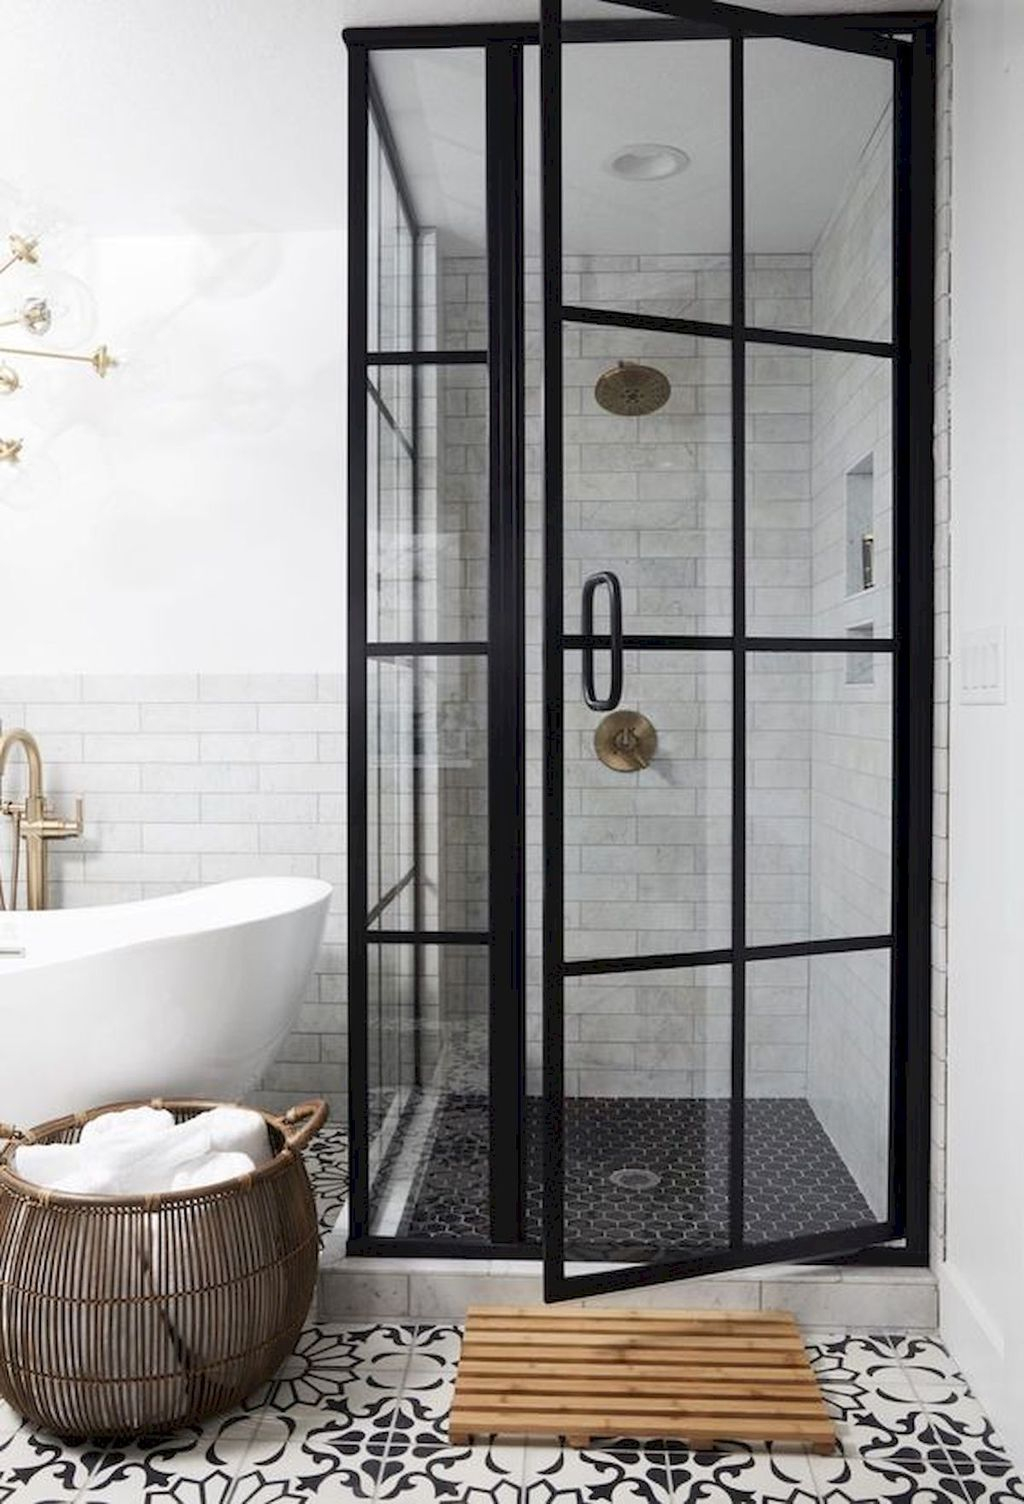 Astonishing Farmhouse Shower Tile Decor Ideas To Try 15